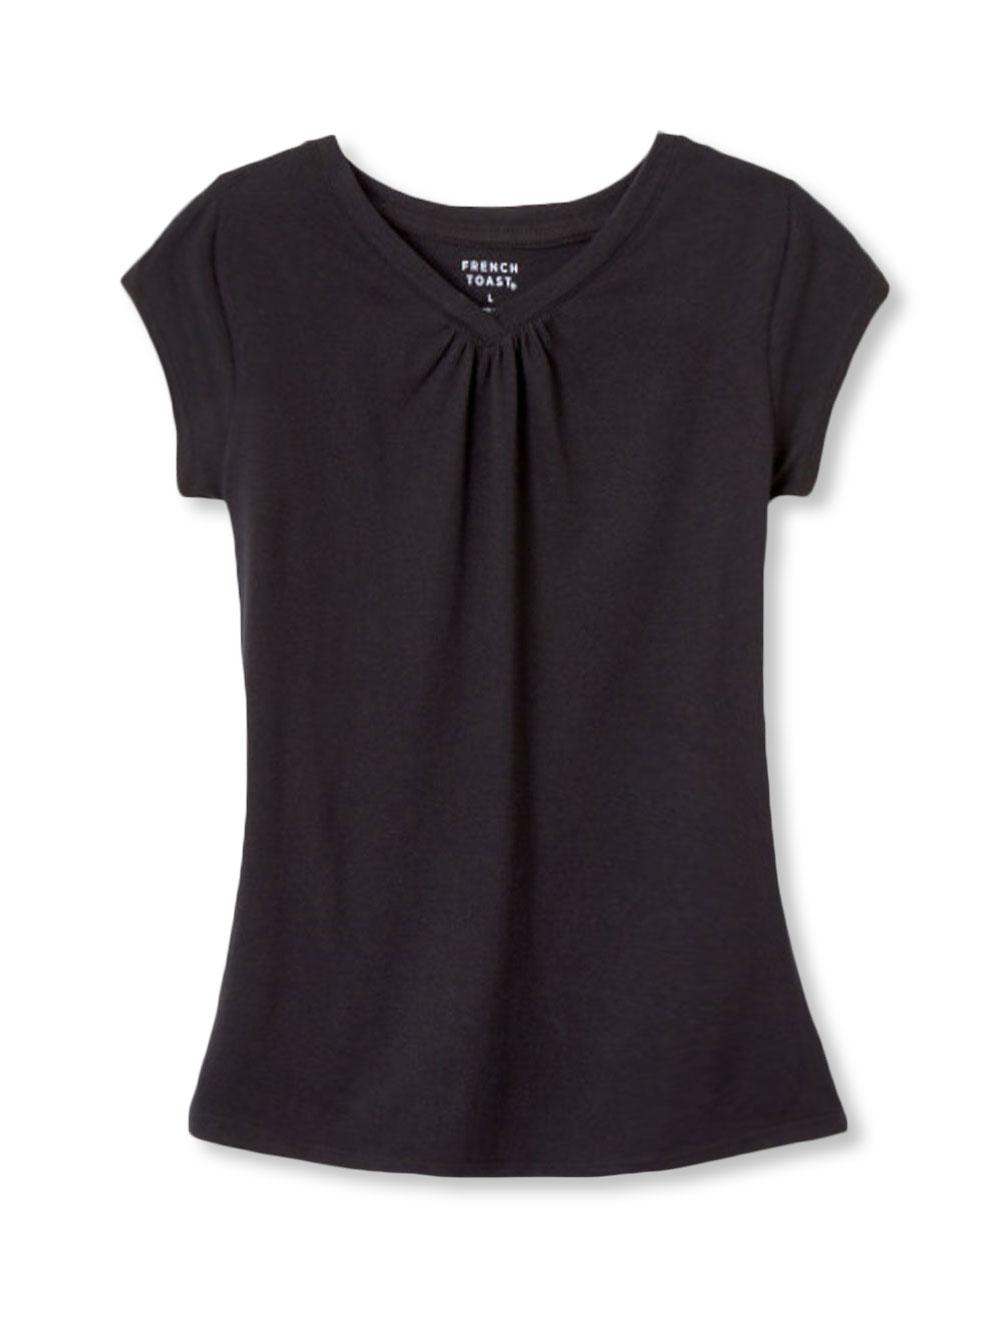 Image of French Toast Little Girls Ruched VNeck TShirt Sizes 4  6X  black 4